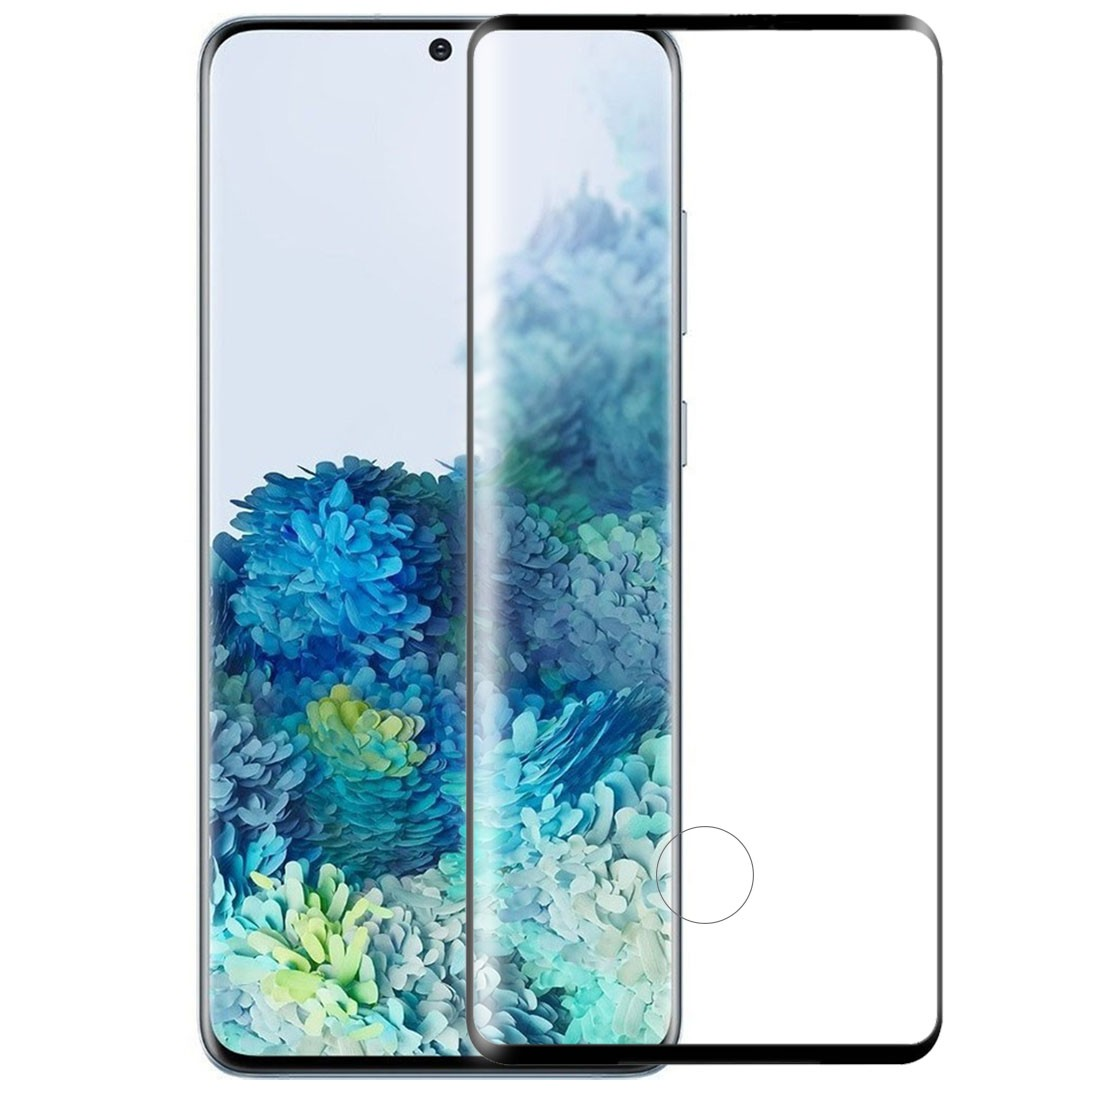 Película de Vidro Curva Samsung Galaxy S20 Plus 6.7 pol SM-G985